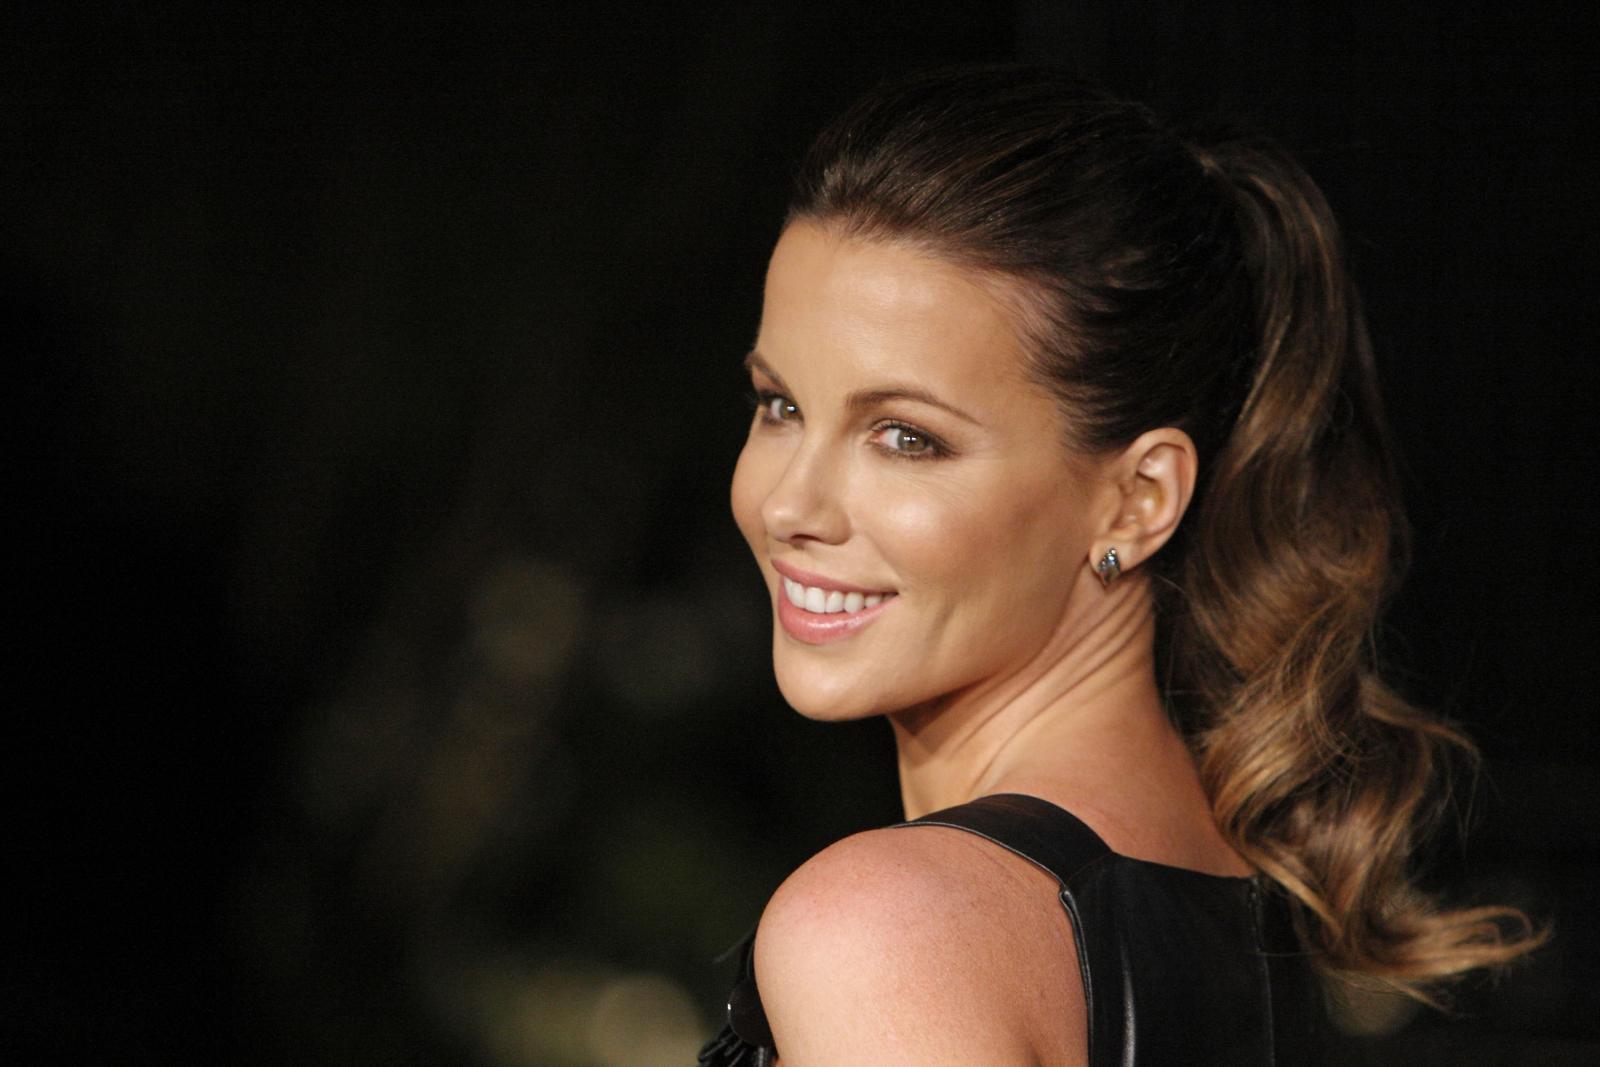 Royal ambition: Could Kate Beckinsale play Princess ... Kate Beckinsale